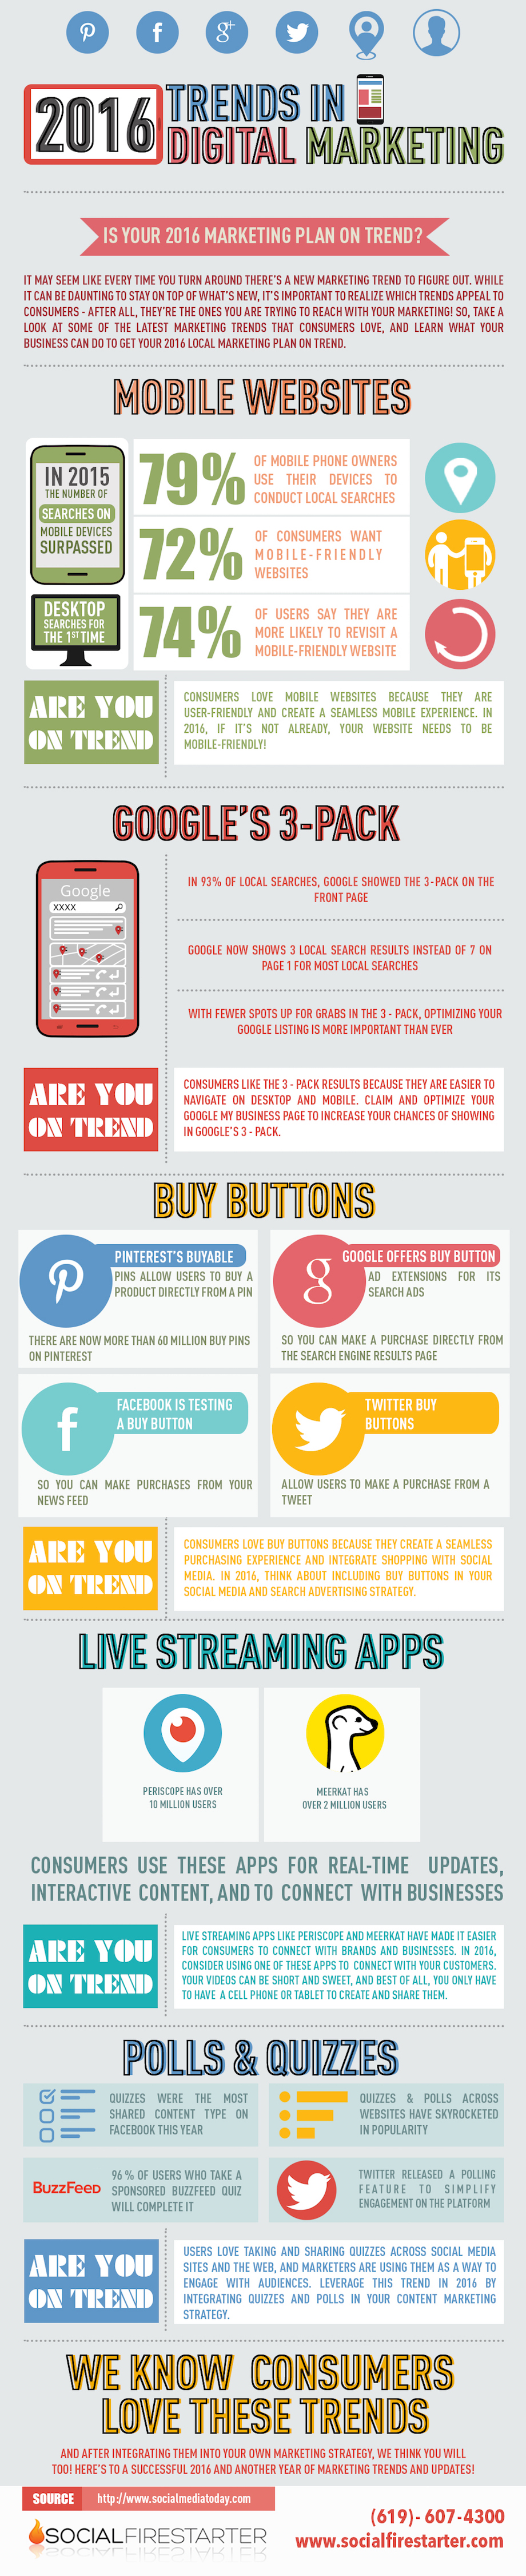 2016 Trends in Digital Marketing